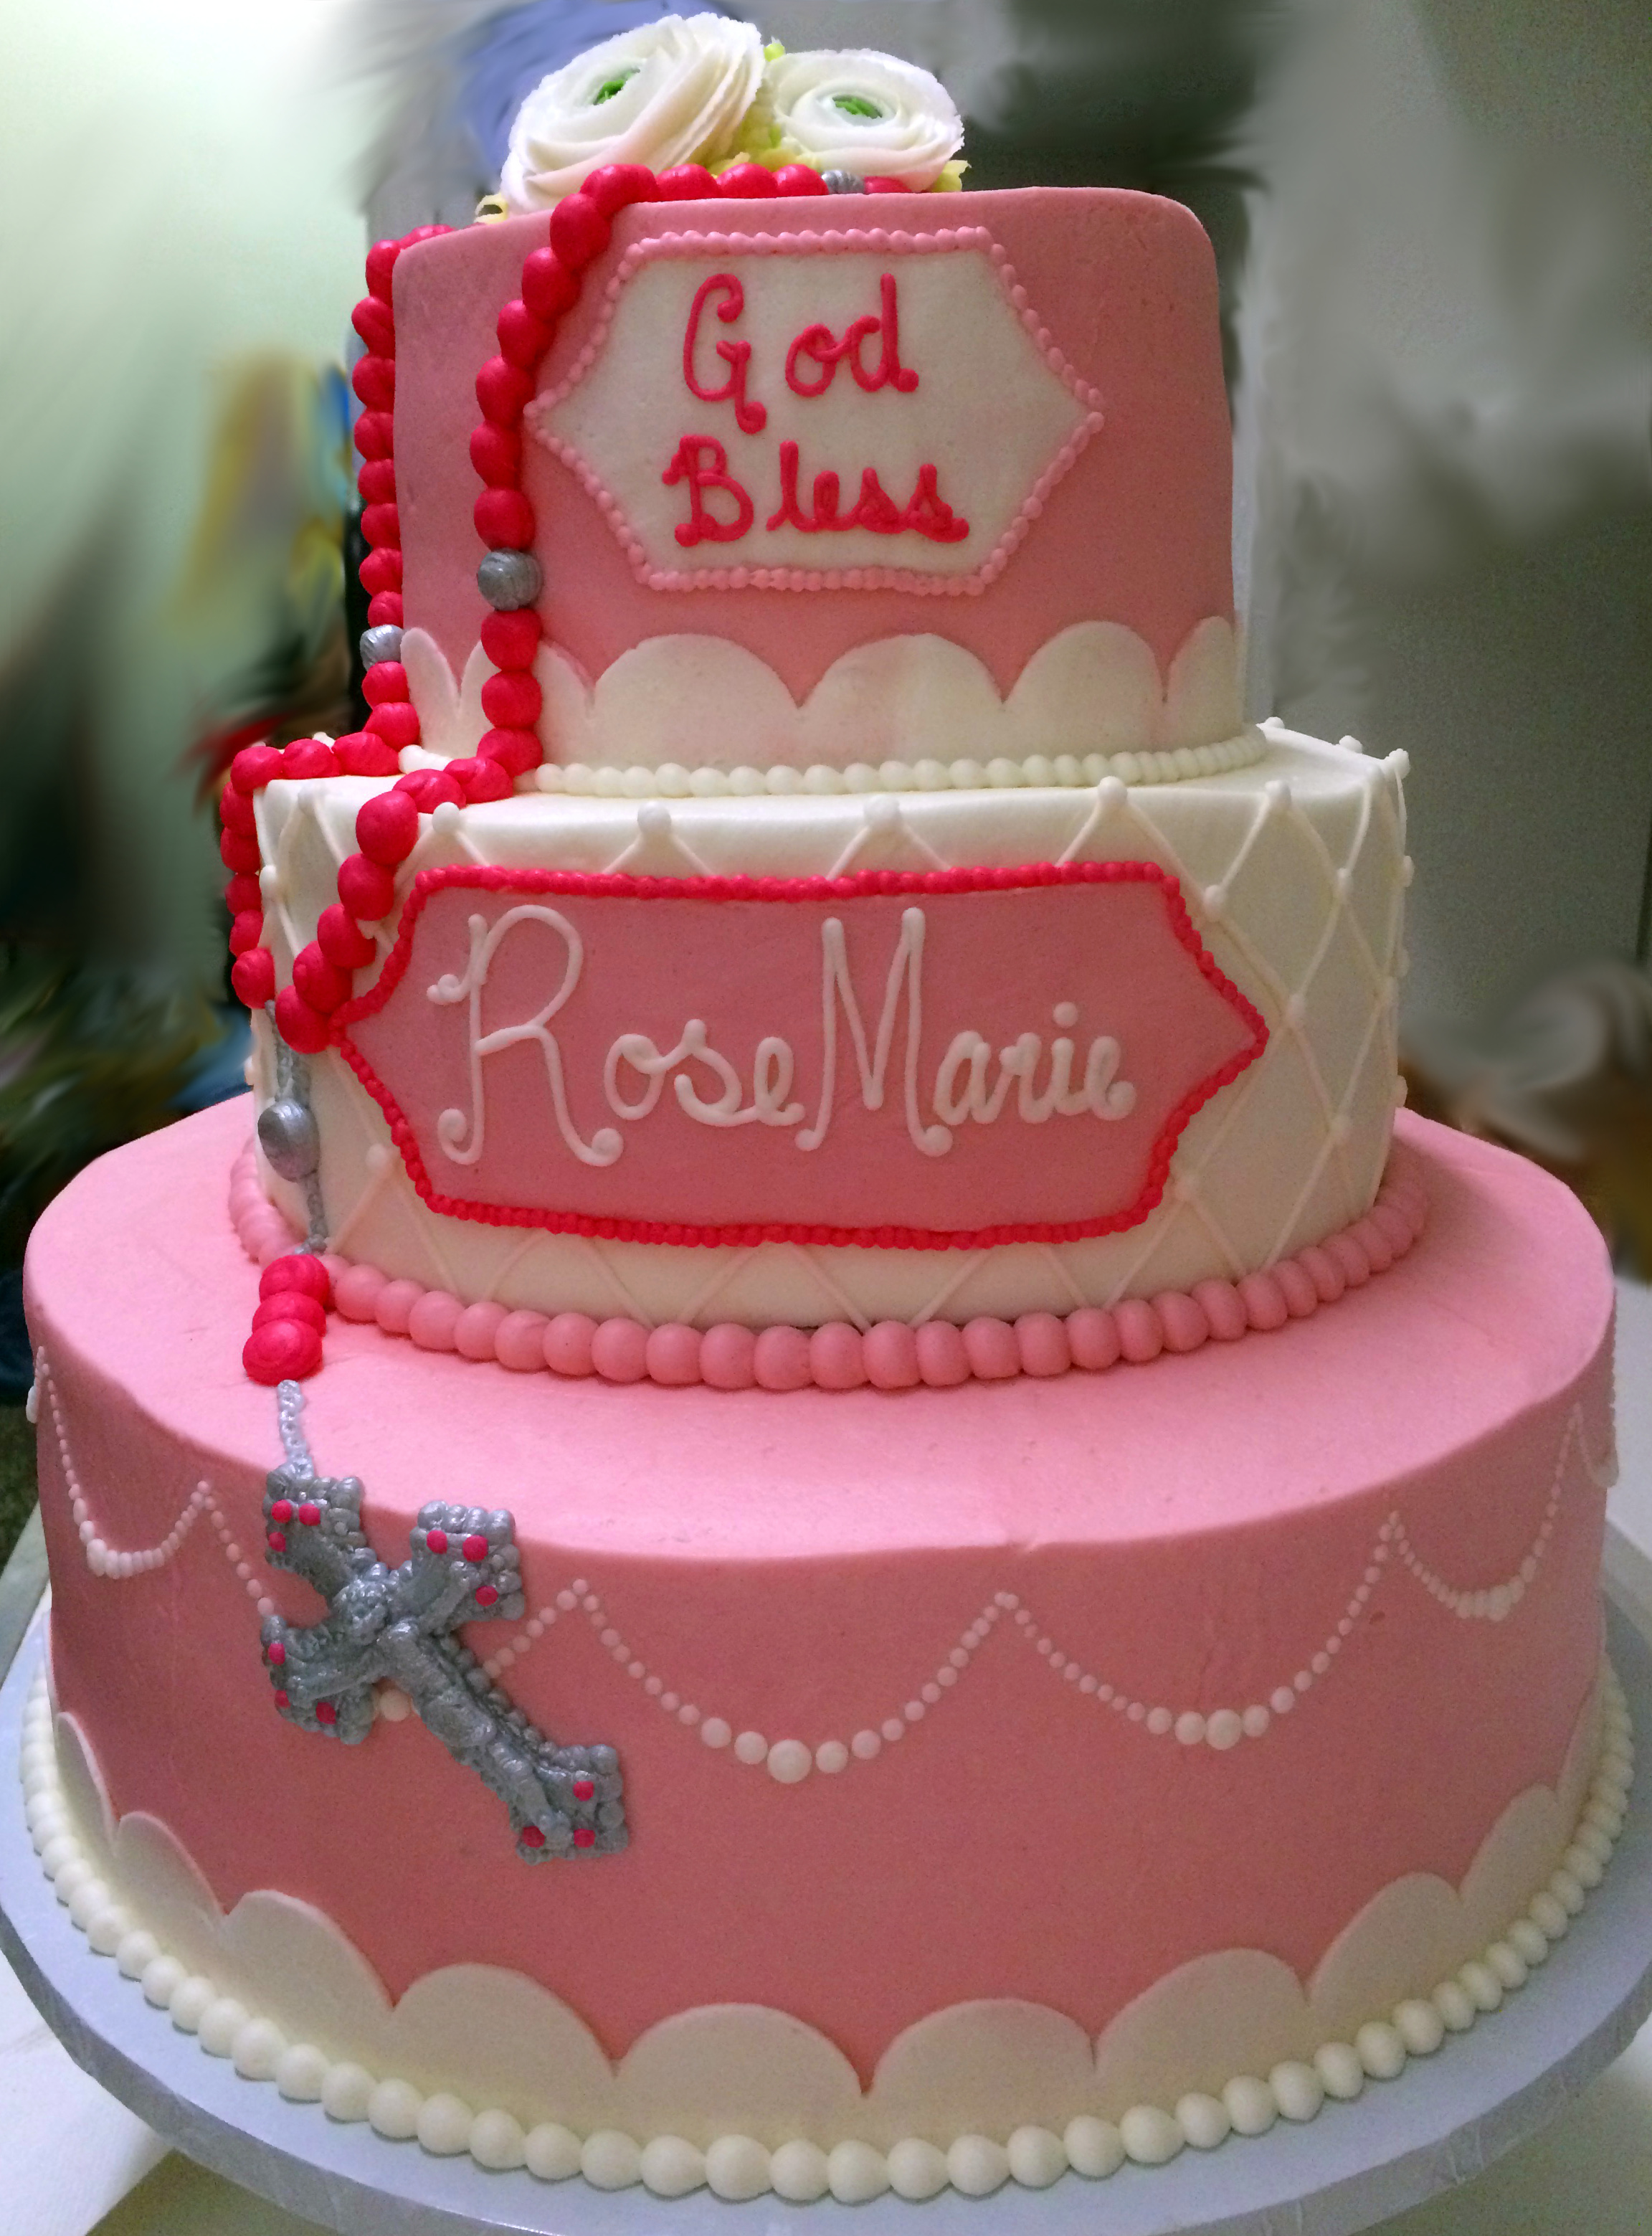 3 Tier Christening Cake 26